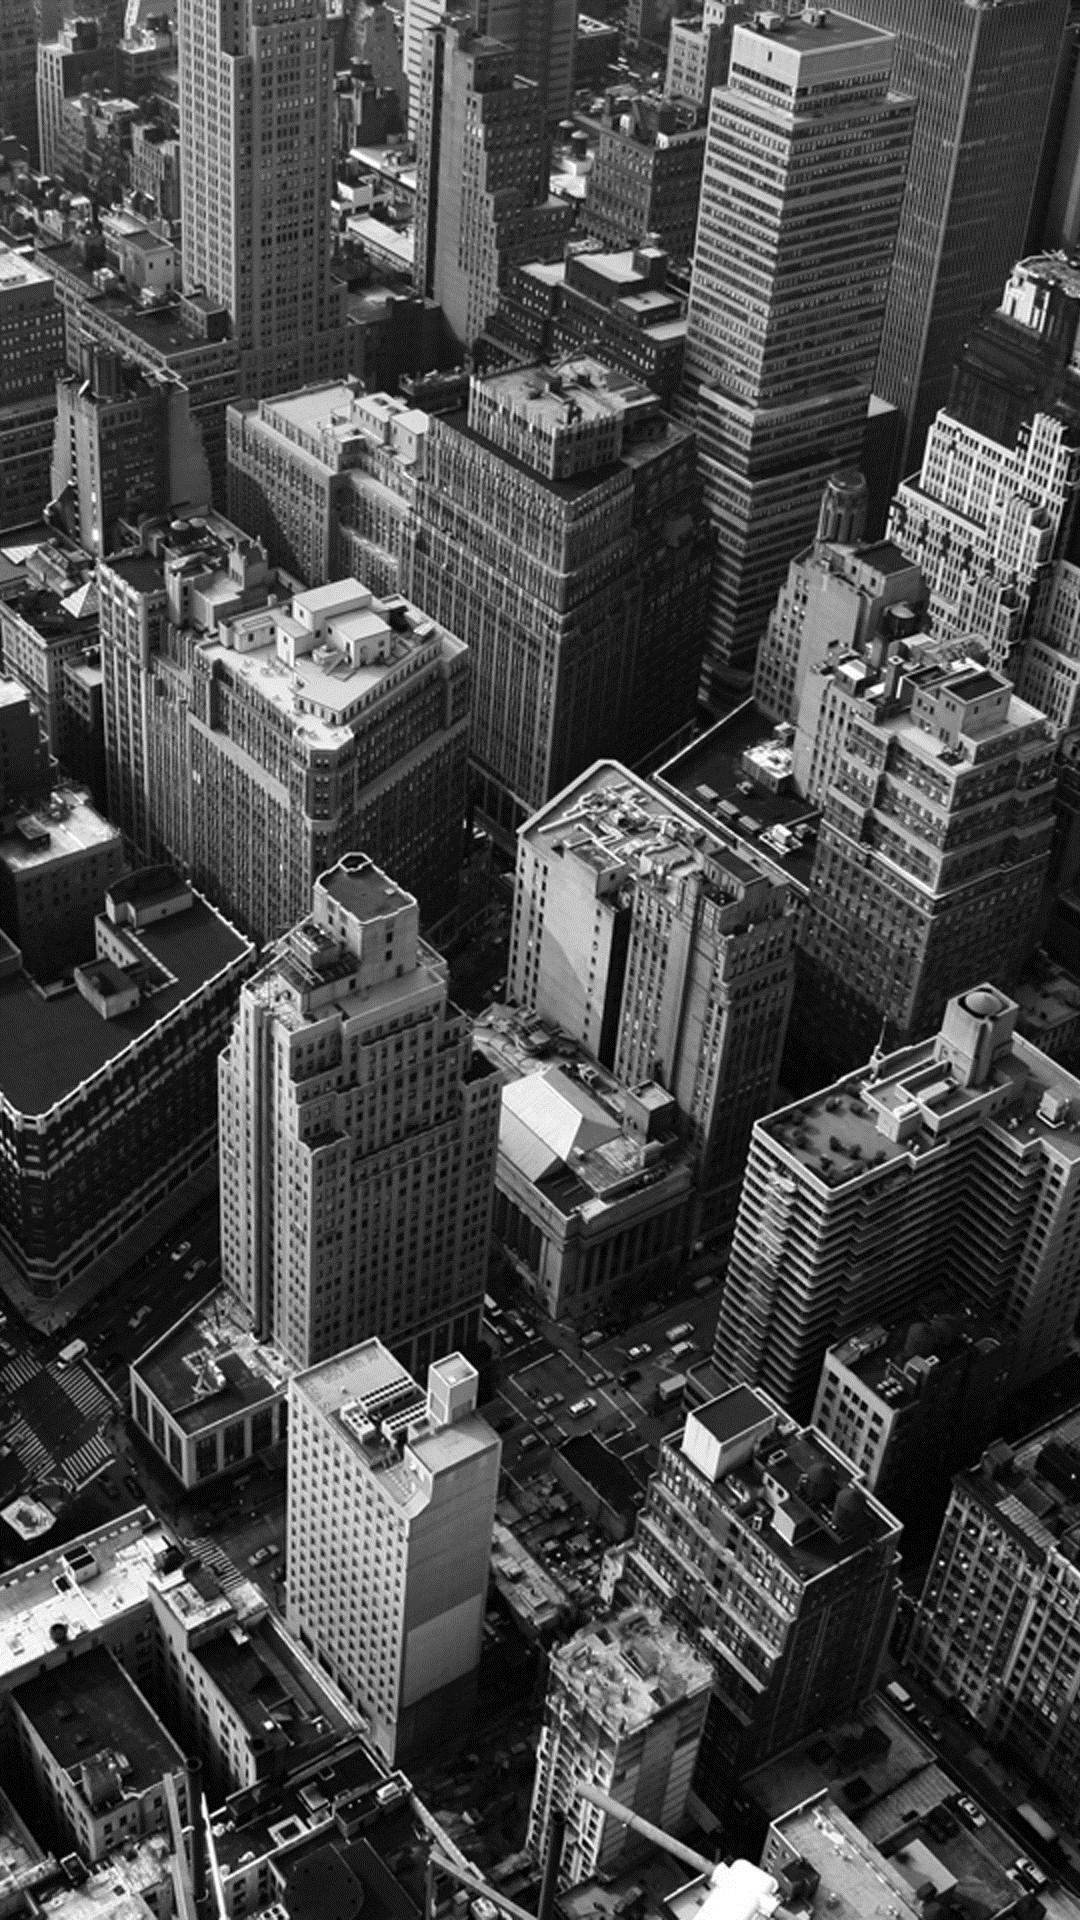 City iphone 5 wallpaper